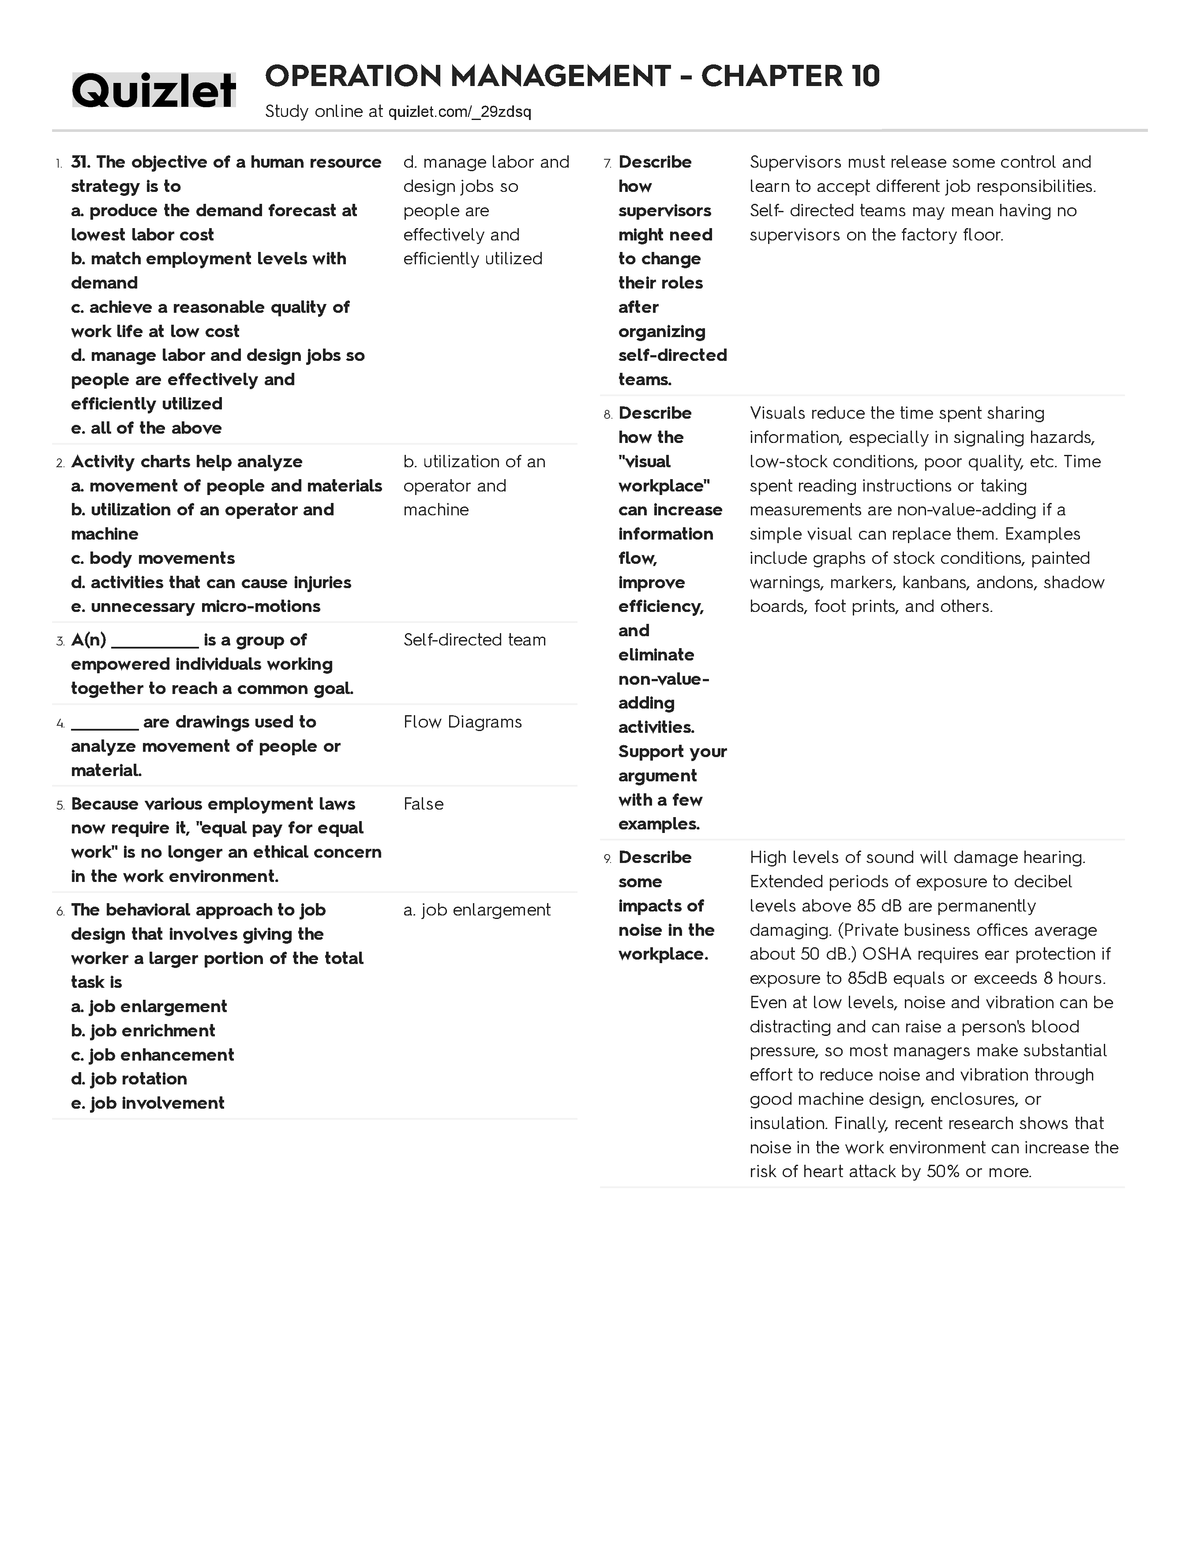 Exam 2018 - MSCI30000001: Operations Management - StuDocu